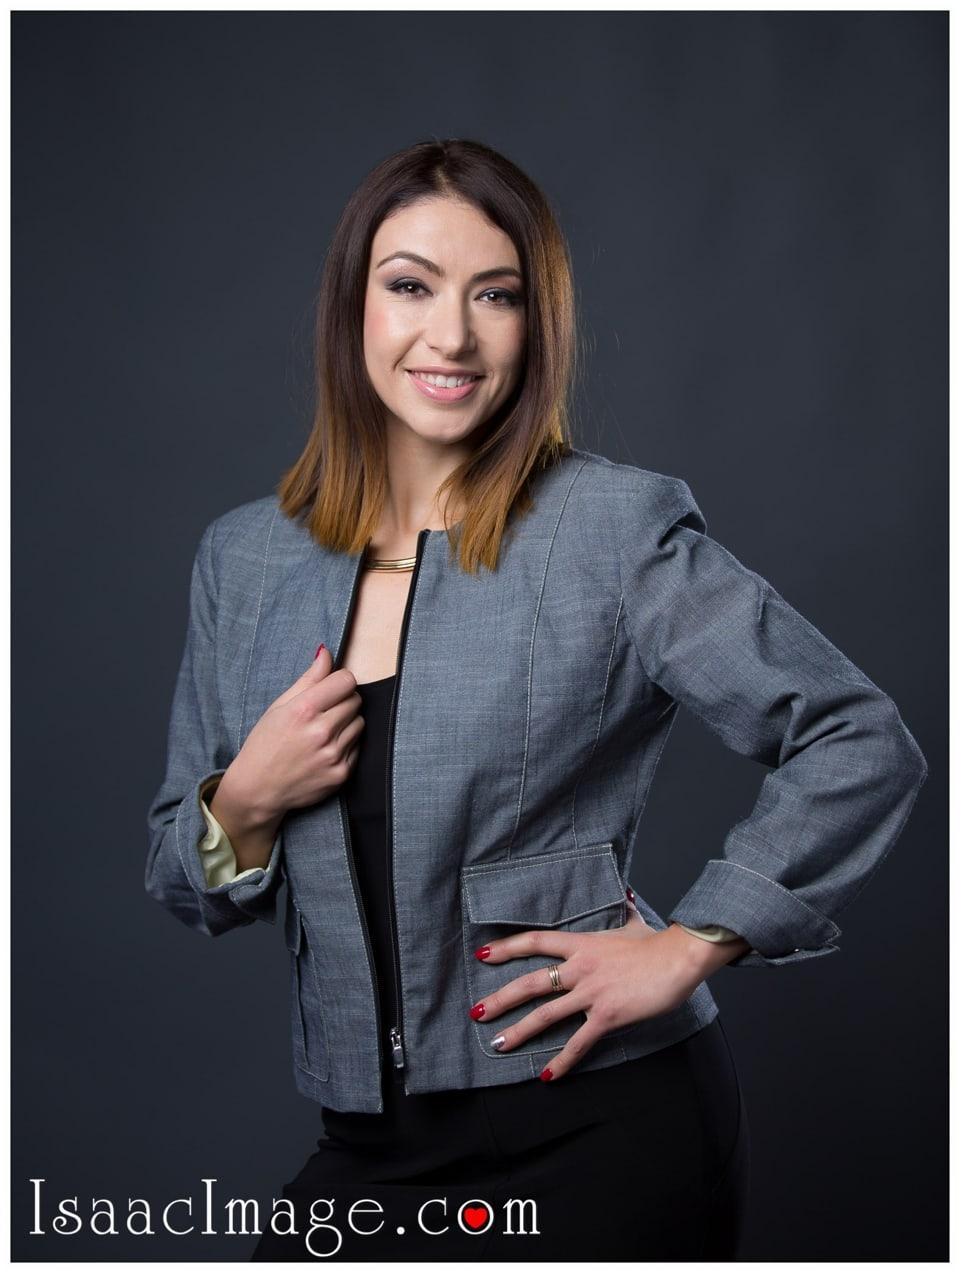 Toronto Business portrait